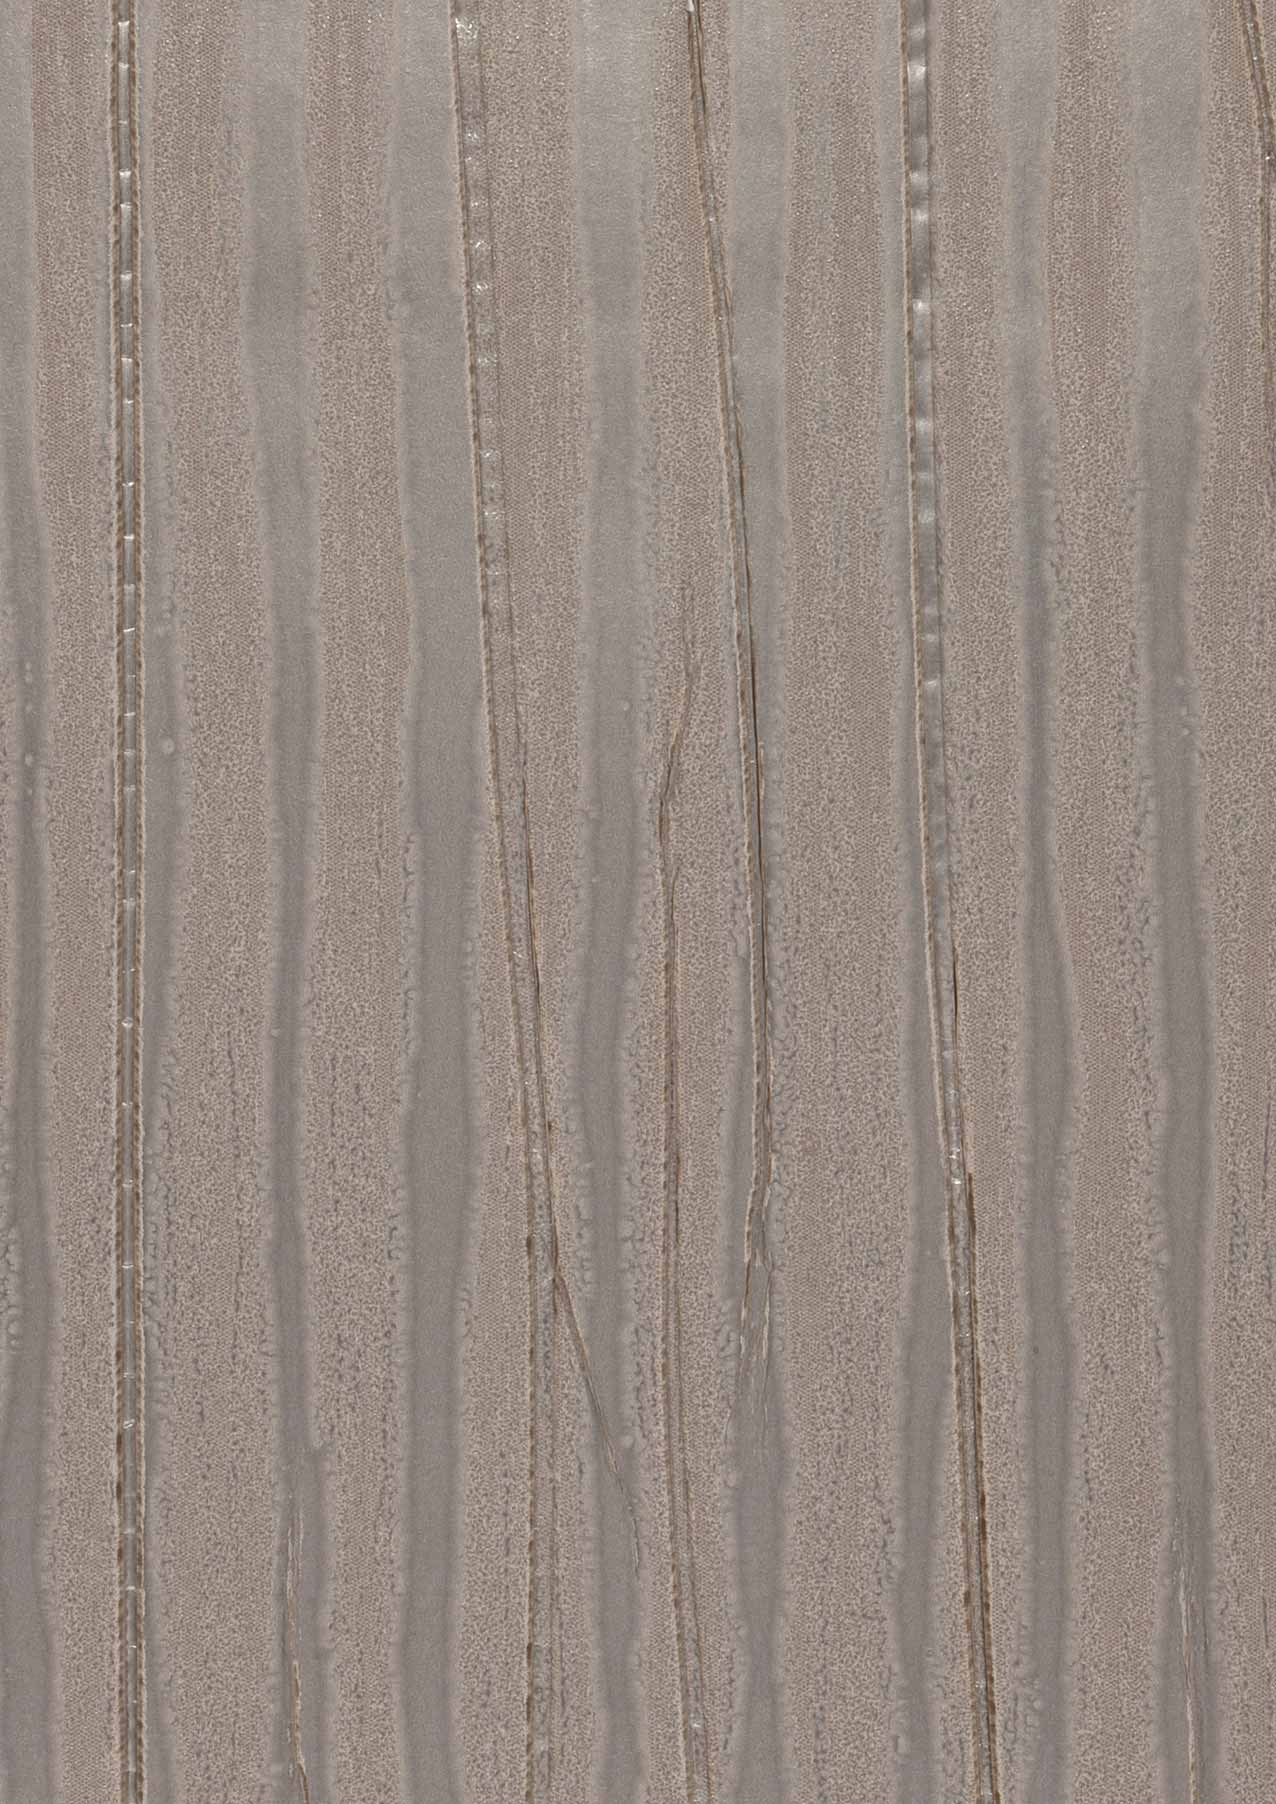 tapete crush metallic 02 perlhellgrau beigegrau grau. Black Bedroom Furniture Sets. Home Design Ideas